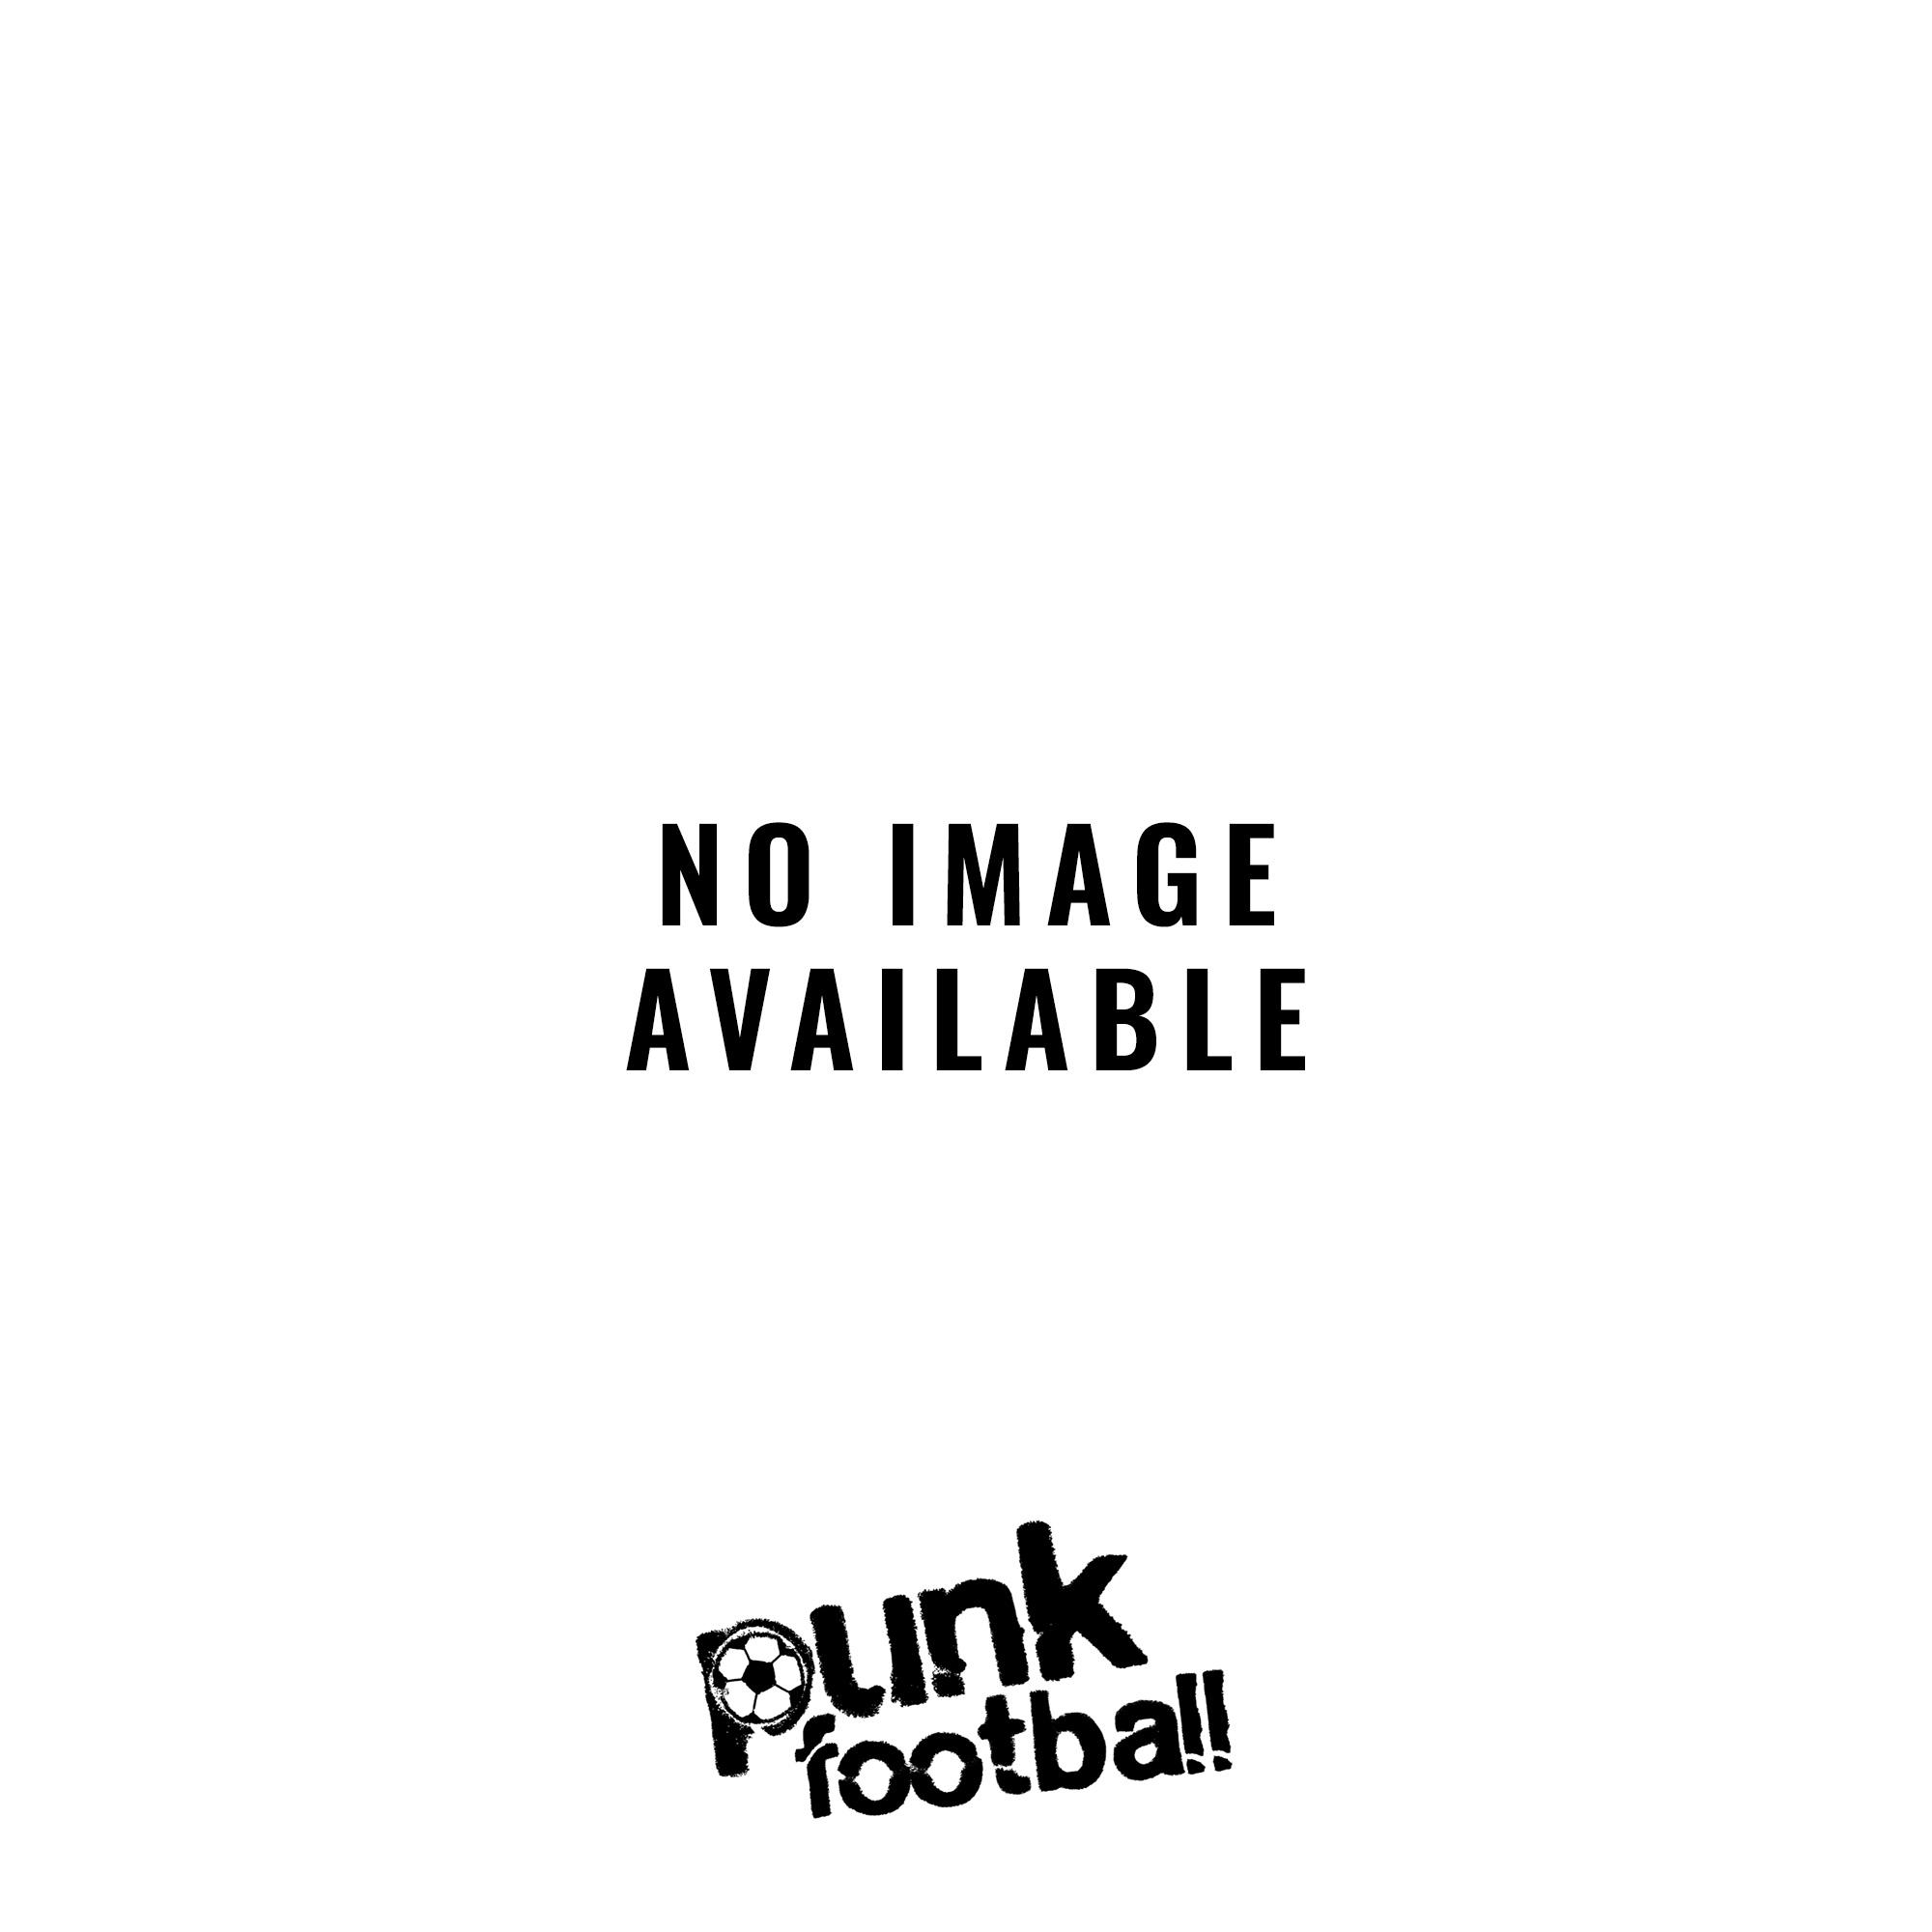 The North West (Bury) T-Shirt